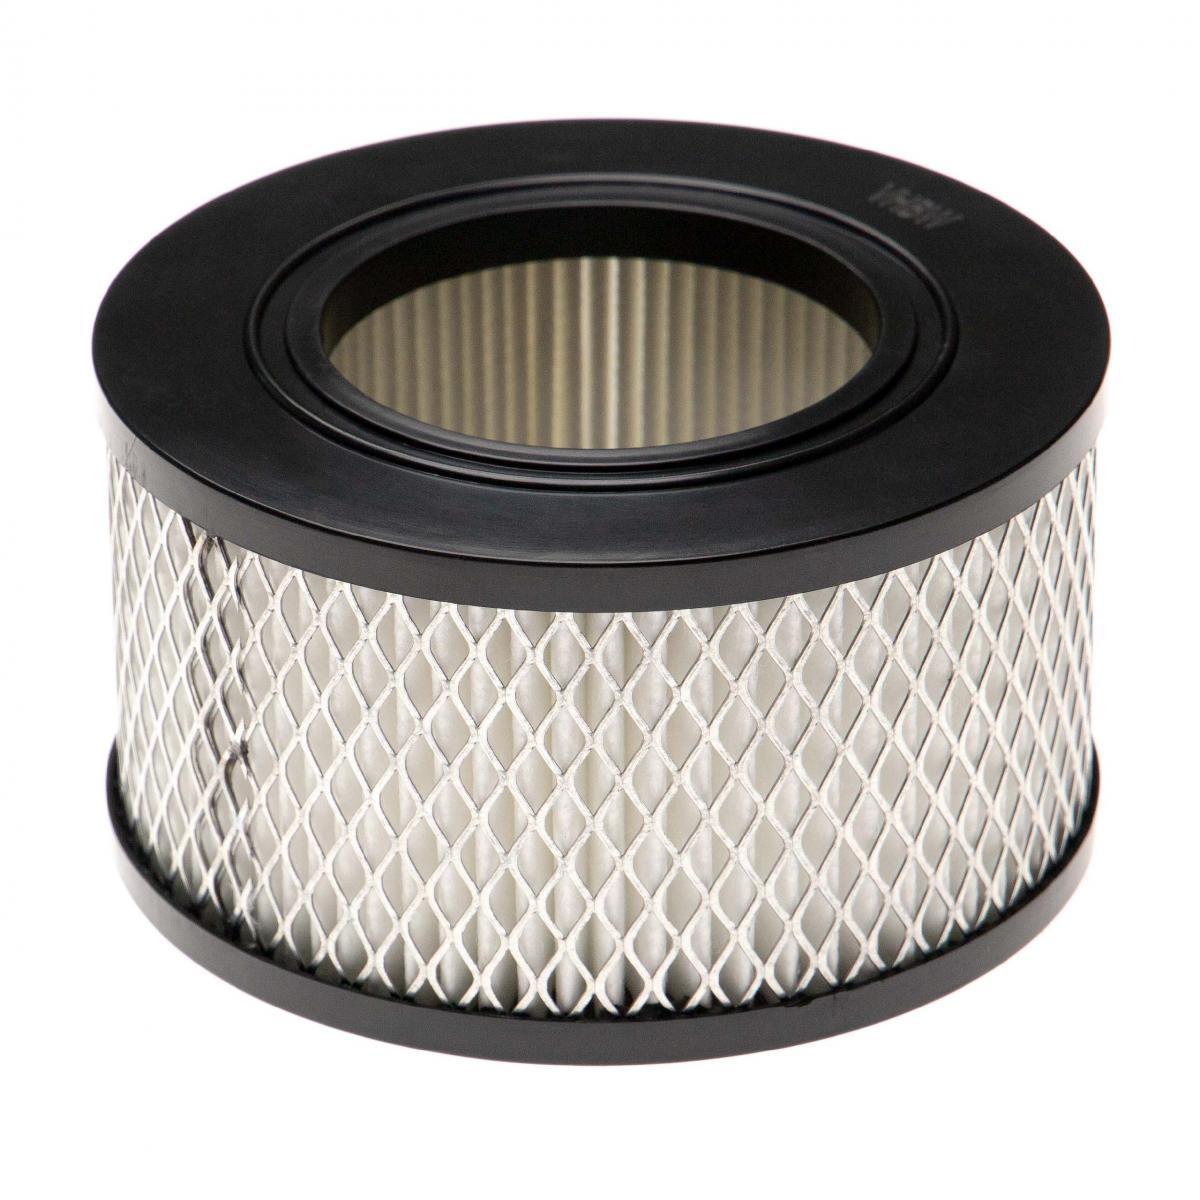 Vhbw vhbw filtre d' aspirateur compatible avec Nilfisk Attix 33-2H PC, 33-2M IC, 33-xx, 44-2H IC, 44-2M IC, 44-xx aspirate